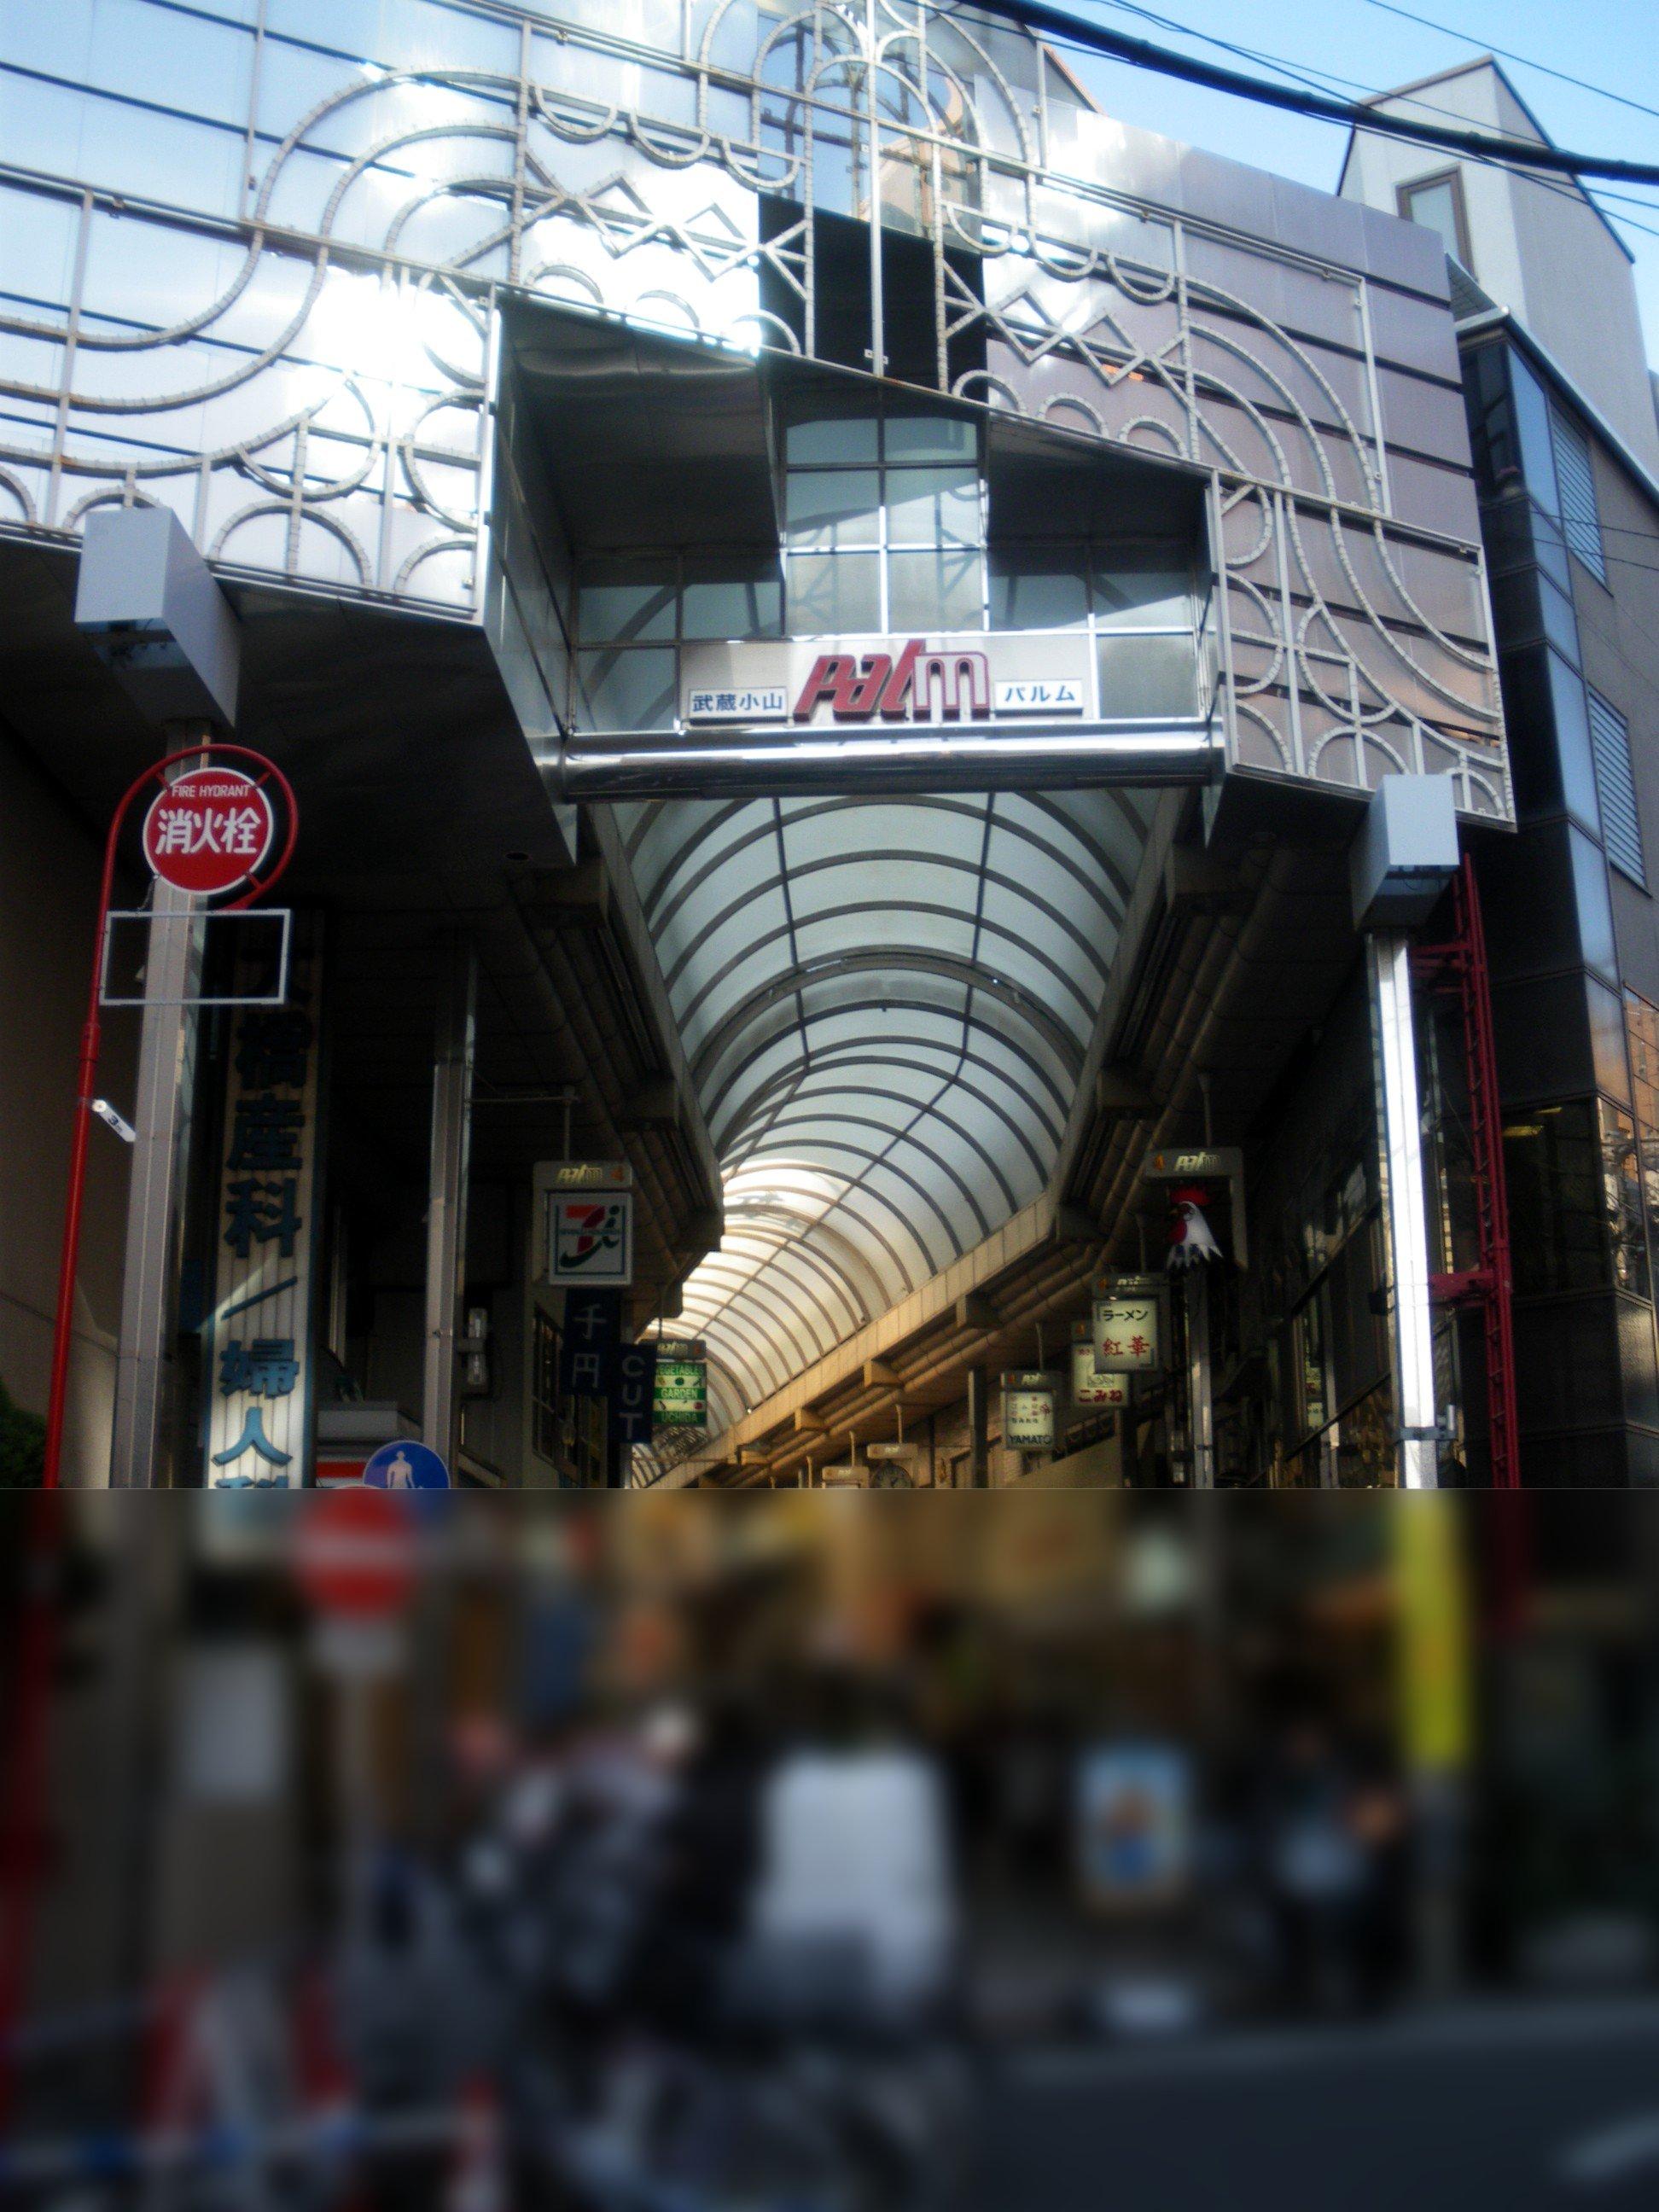 File:Musashikoyama shopping street palm shinagawa tokyo 2009-2.JPG ...